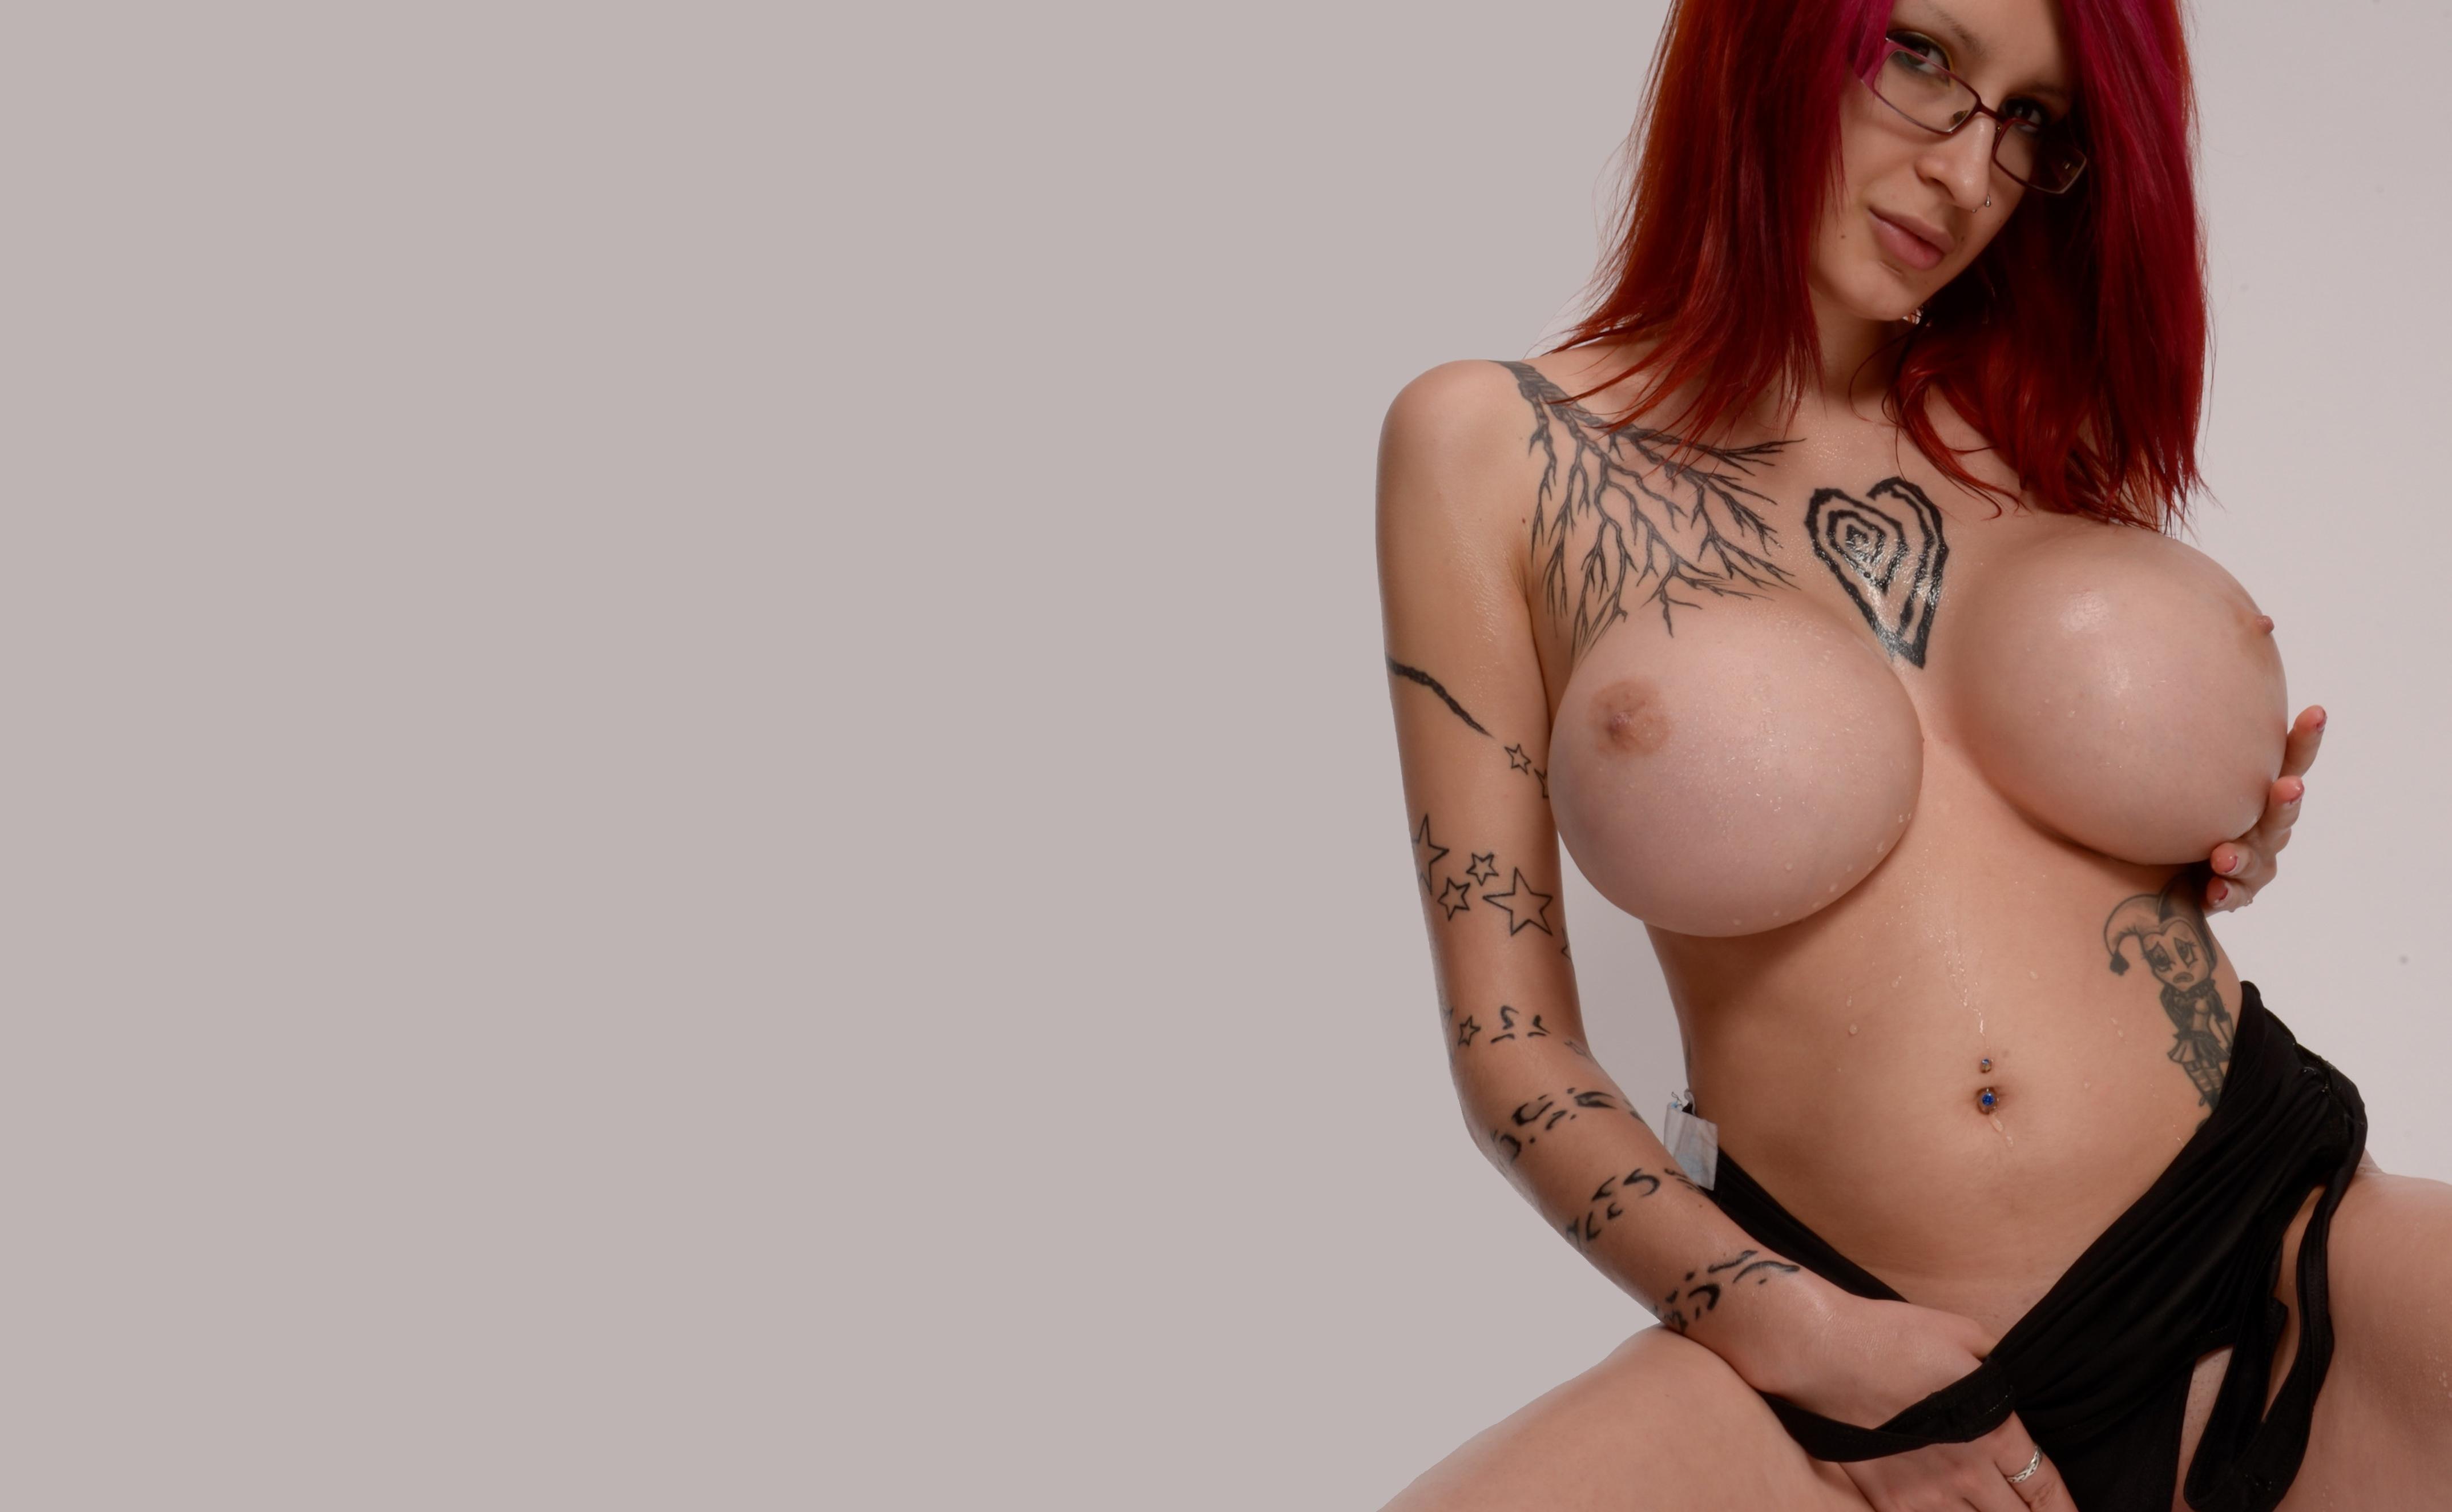 naked bollywood girl photo